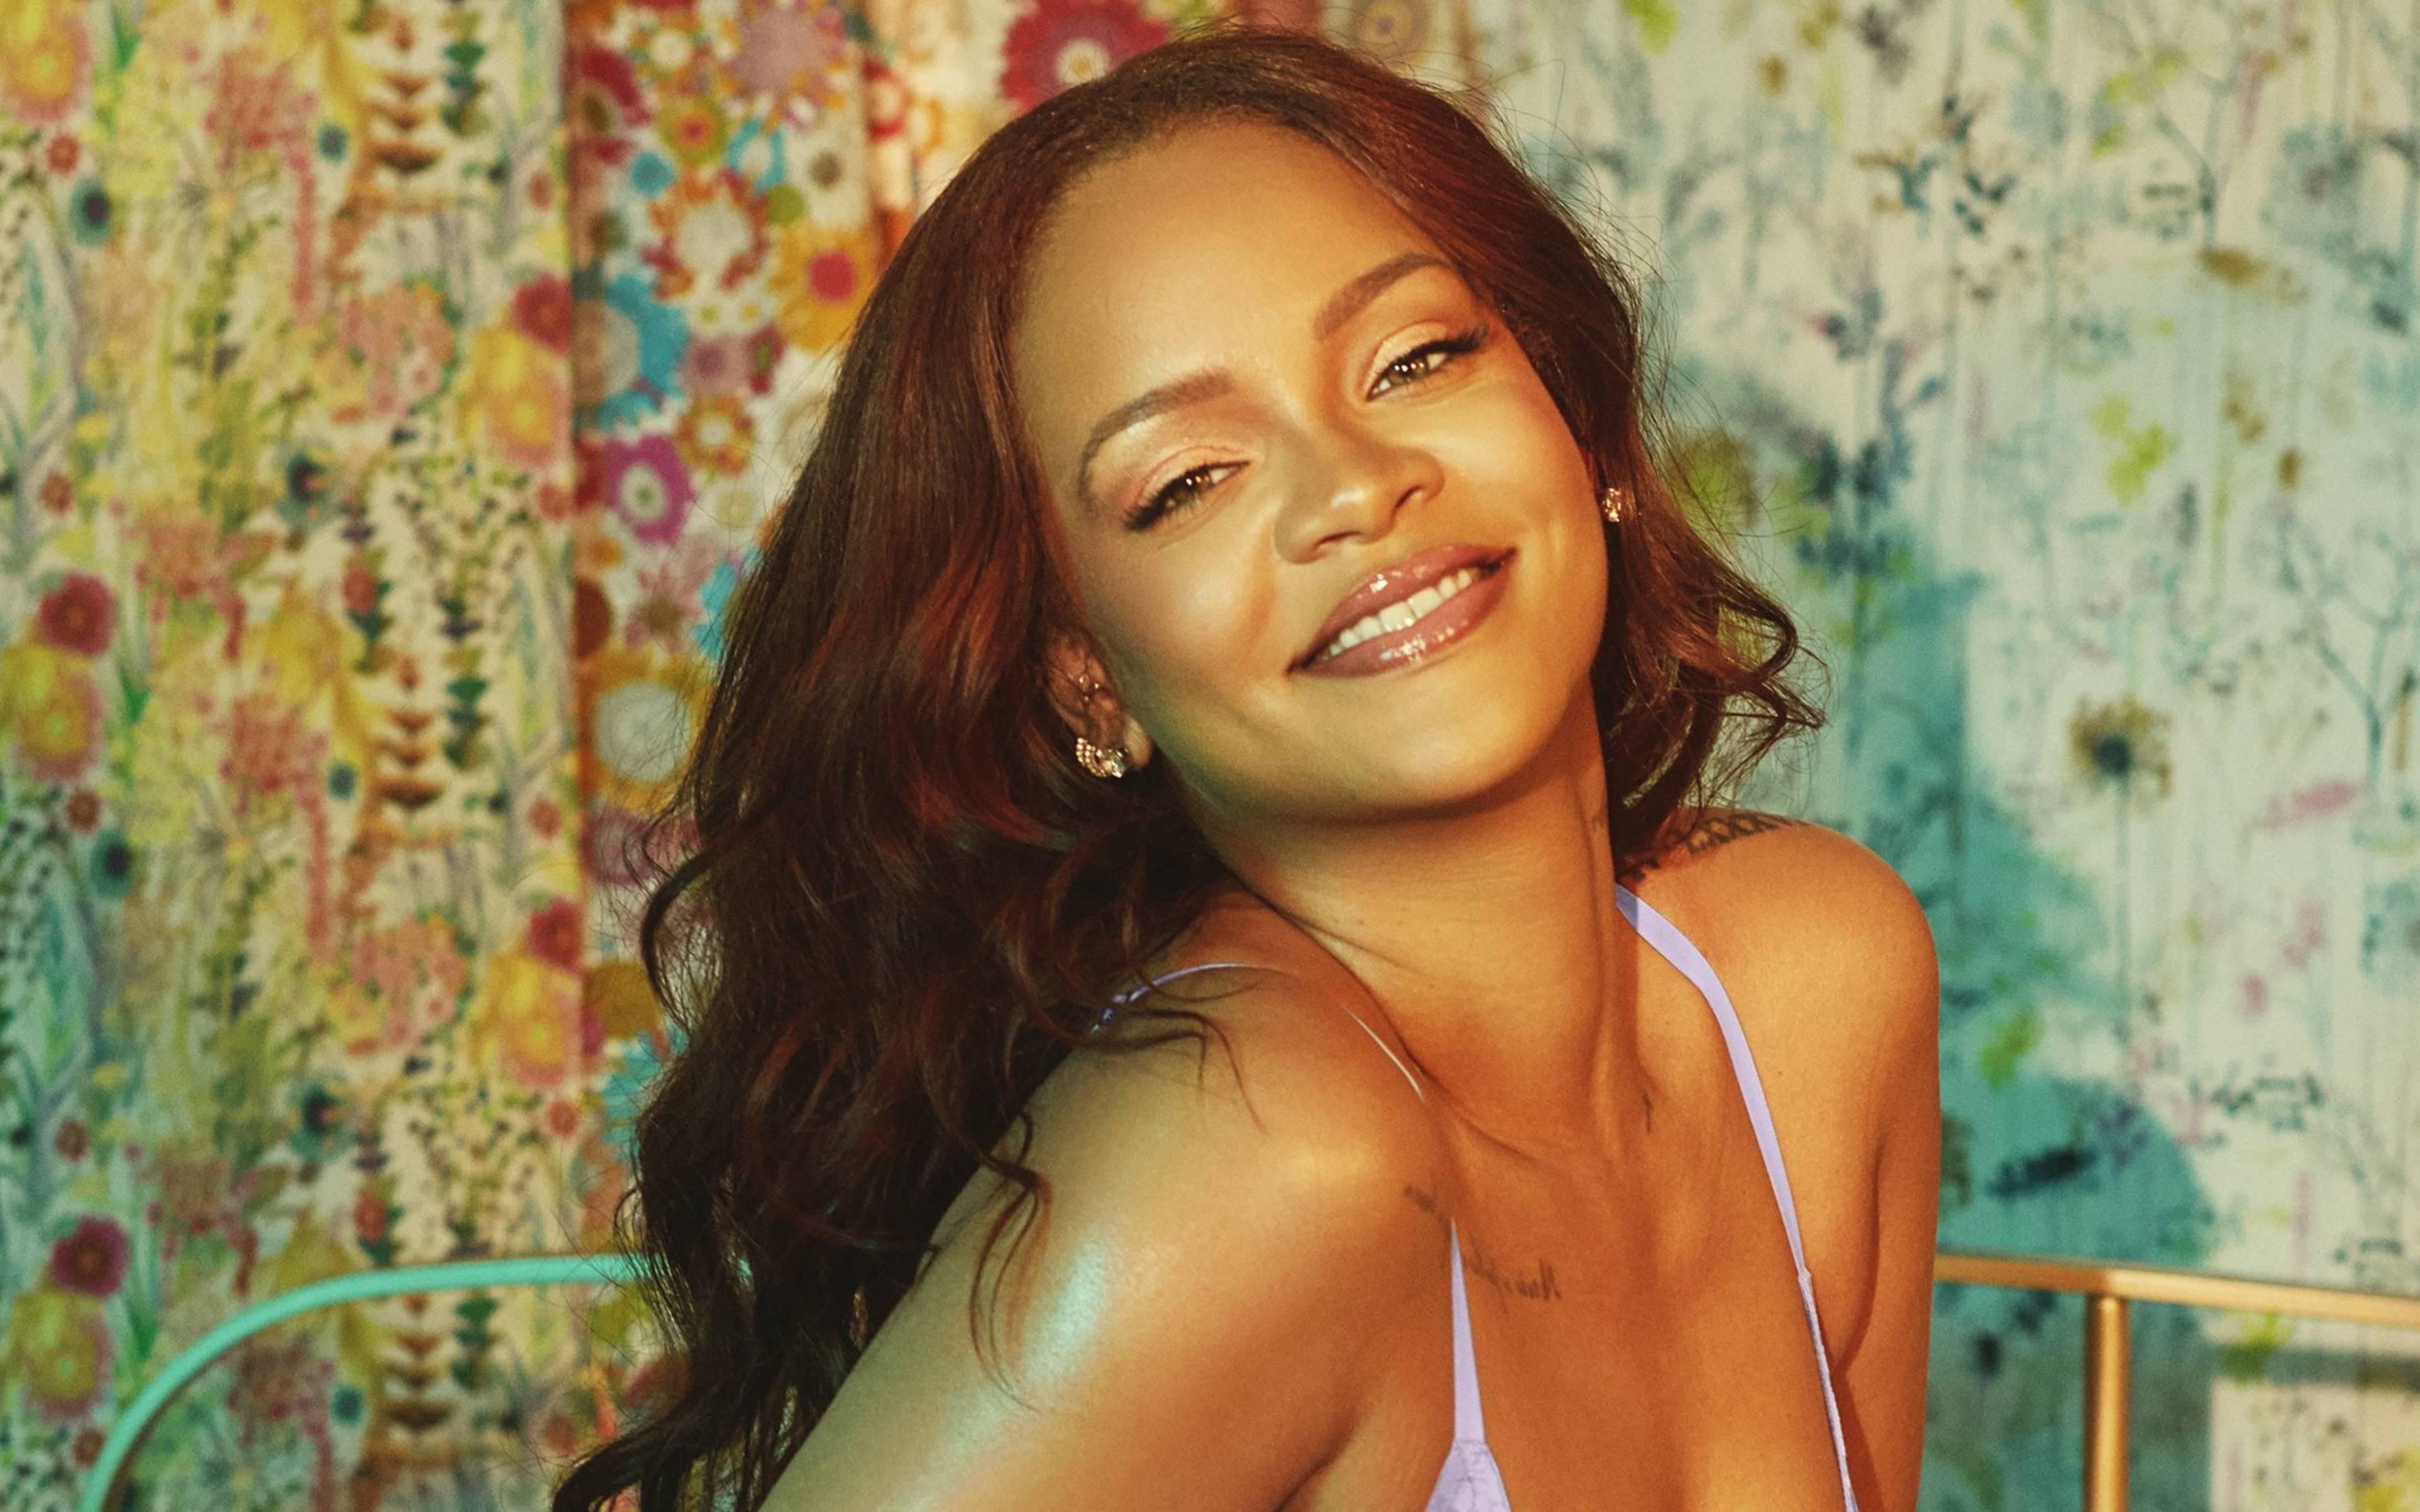 Fondos de pantalla Rihanna sonriendo